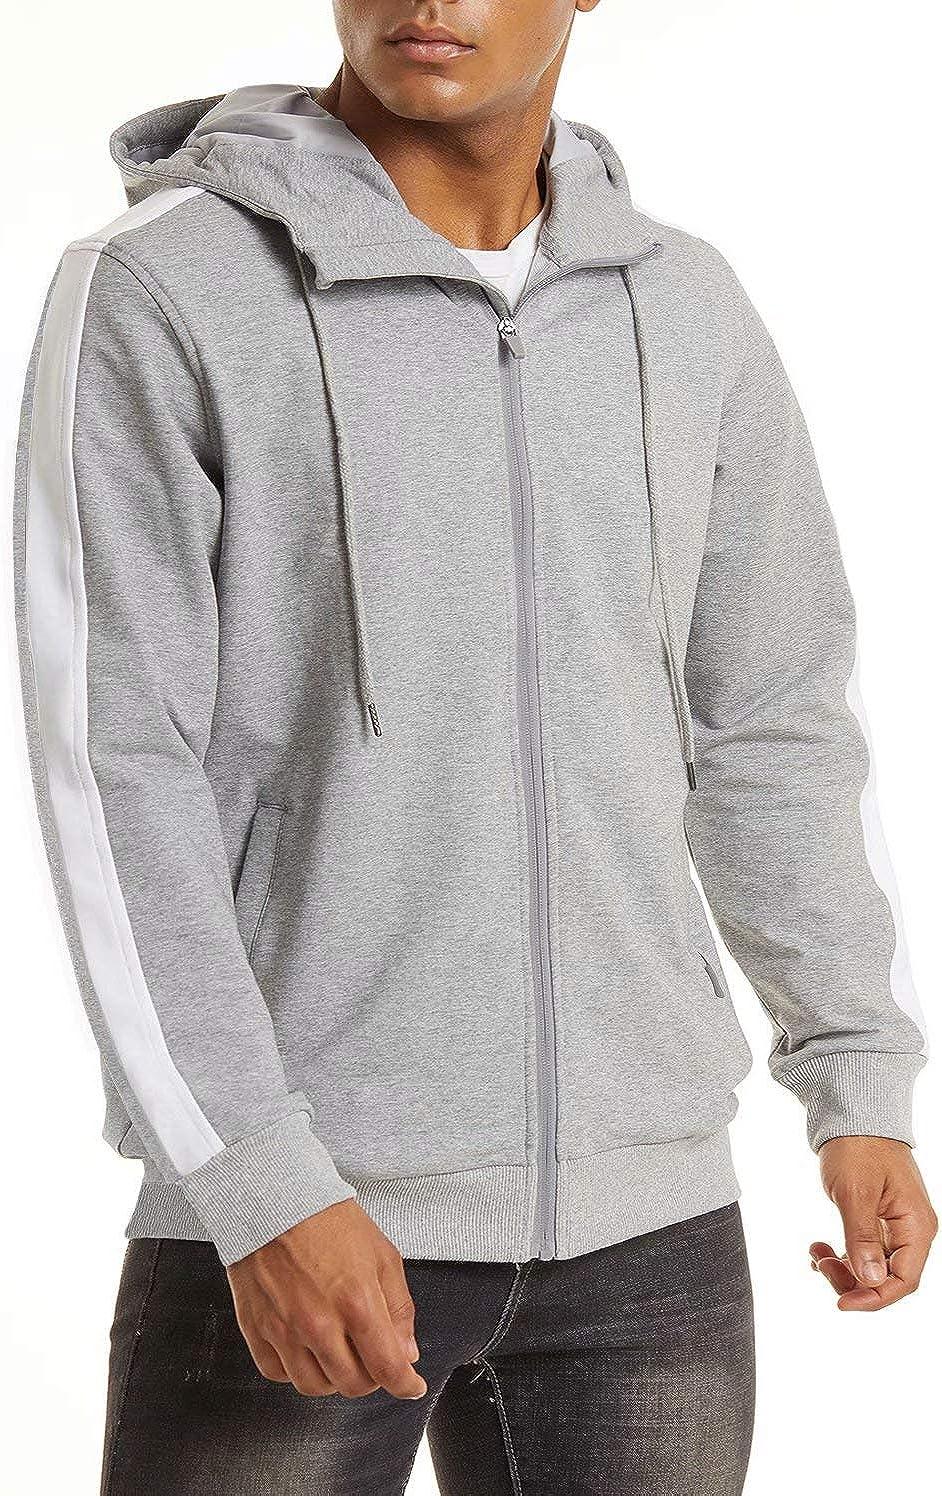 MAGCOMSEN Men's Hoodie Full Zip Fall Cotton Sweatshirts Philadelphia Mall Manufacturer regenerated product Spring J